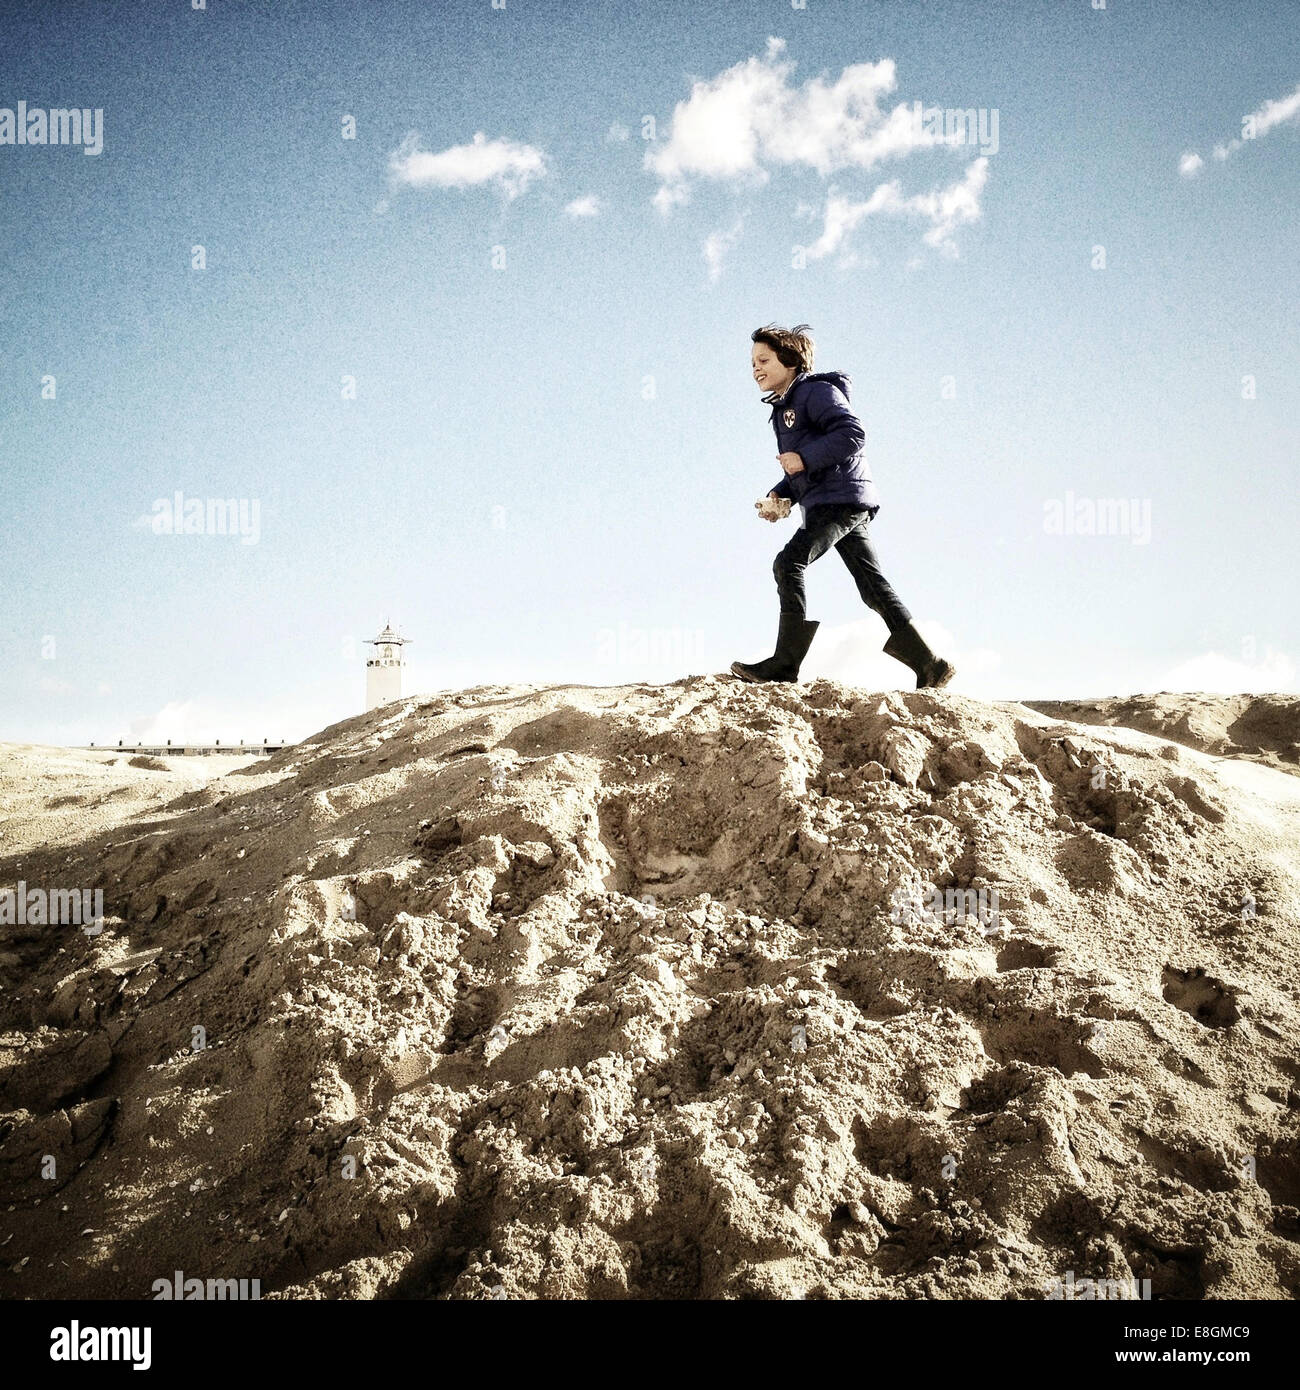 Boy running on sand dune - Stock Image